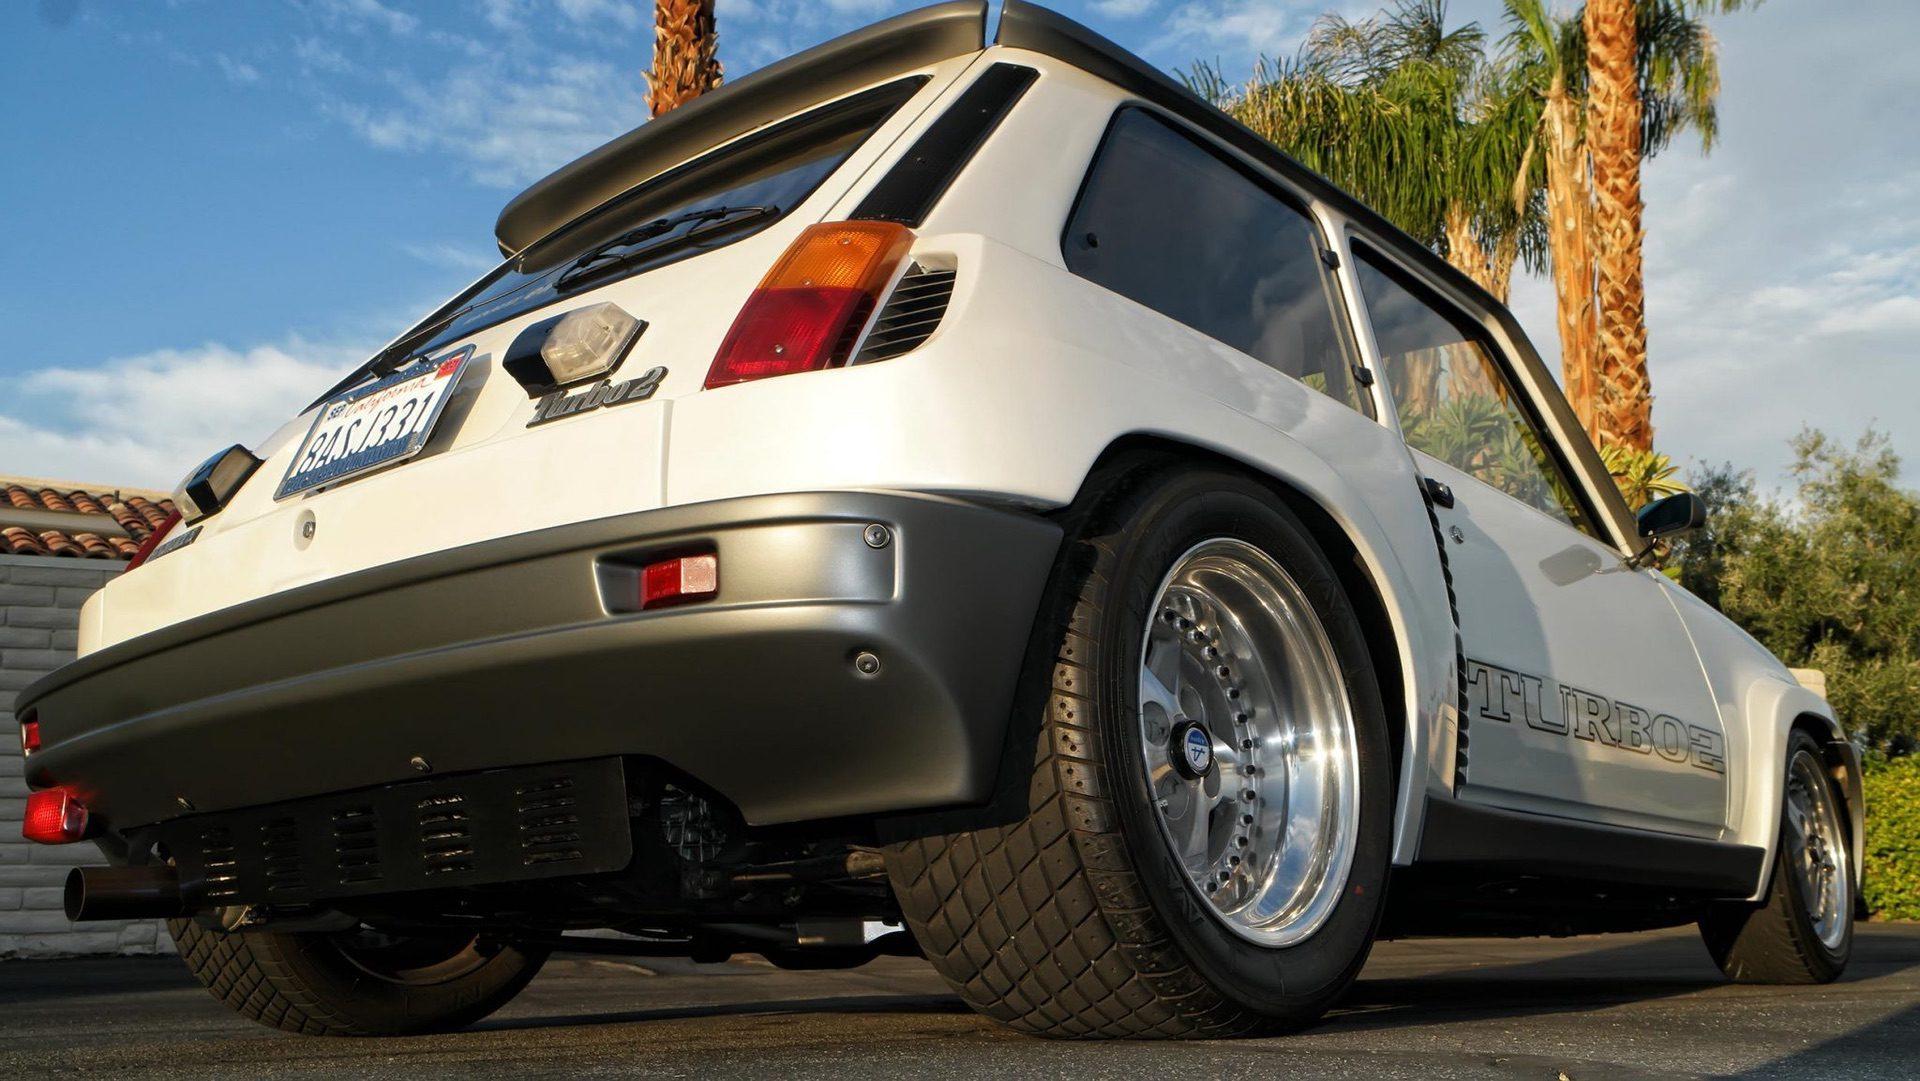 1985_Renault_R5_Turbo_2_rotary-0003